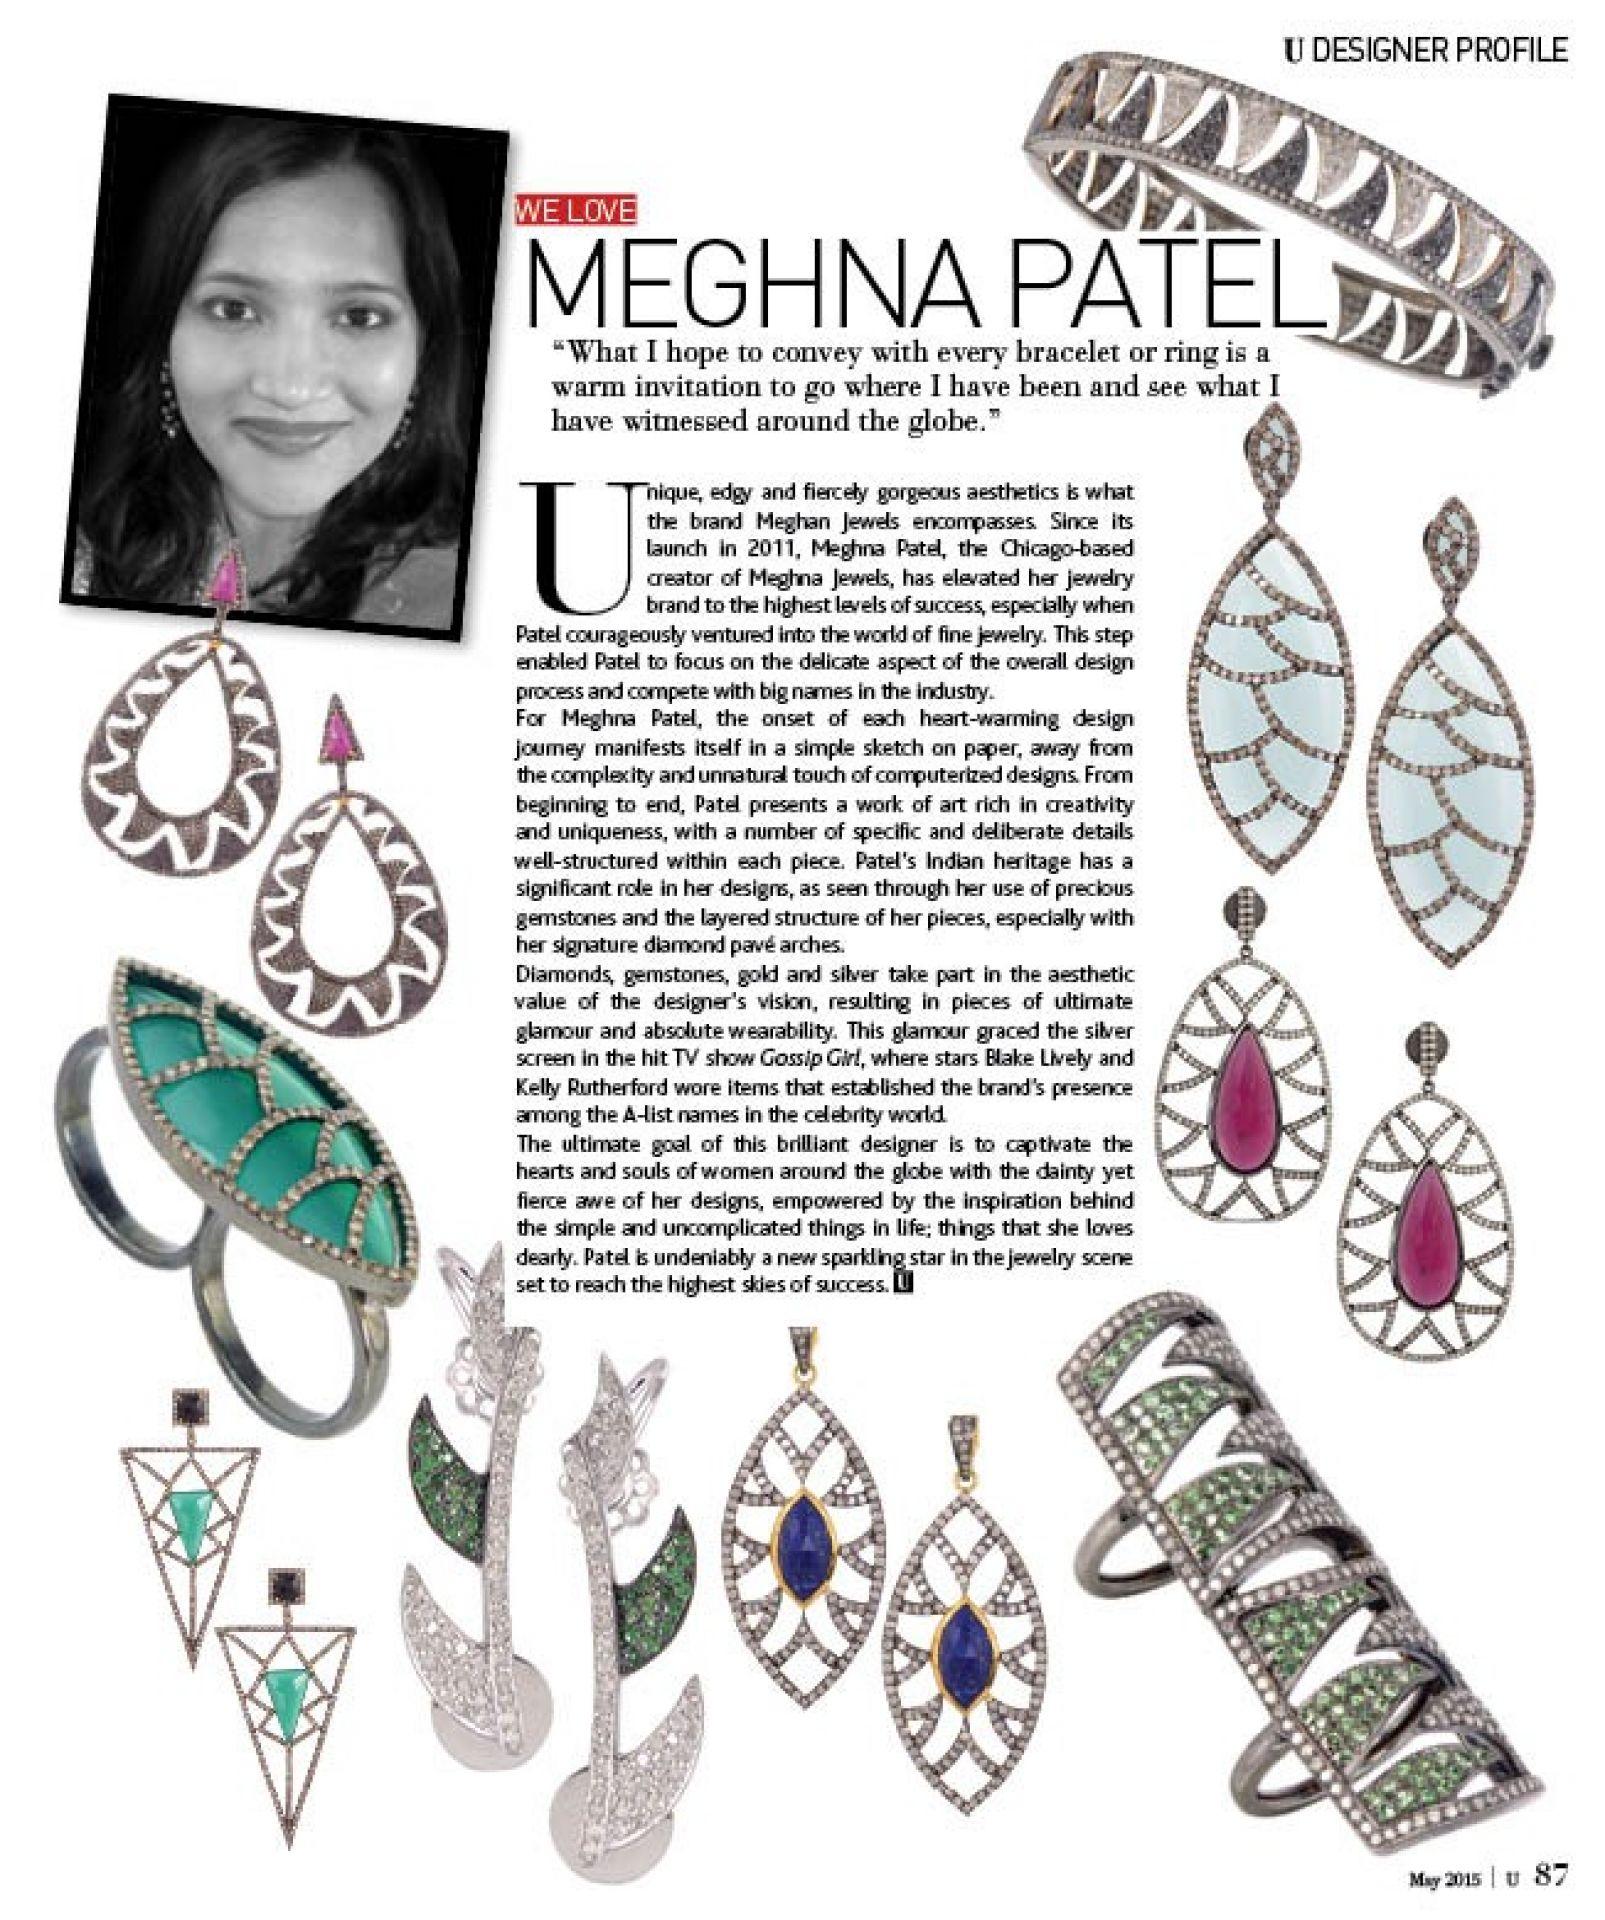 Meghna Jewels Interlocking Claw Earrings 6.22 Black and Diamonds